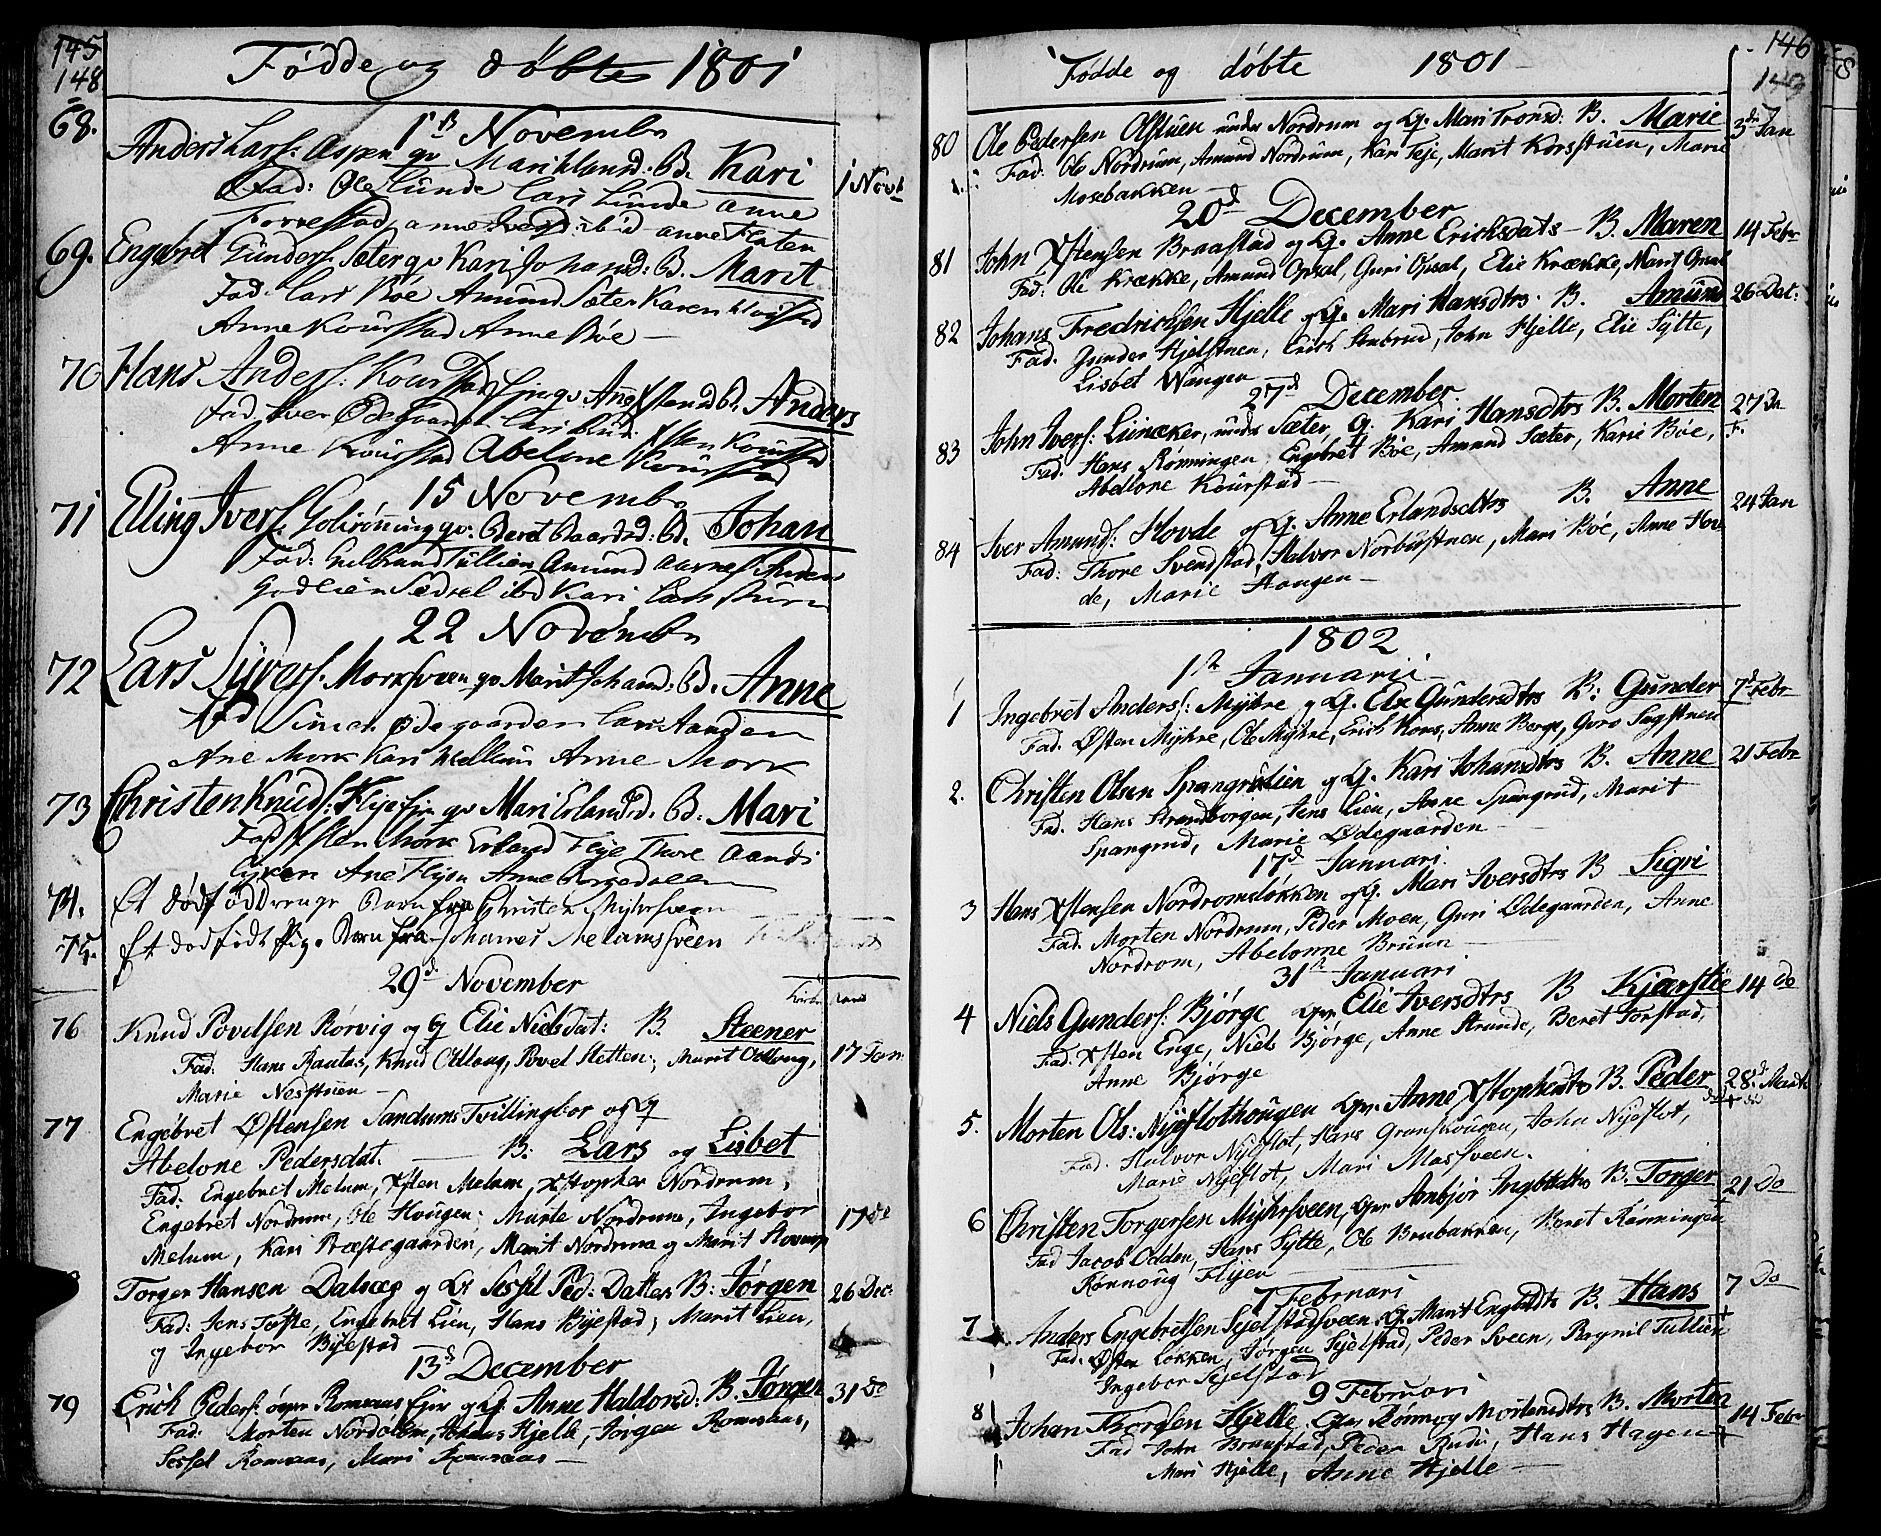 SAH, Ringebu prestekontor, Ministerialbok nr. 3, 1781-1820, s. 148-149